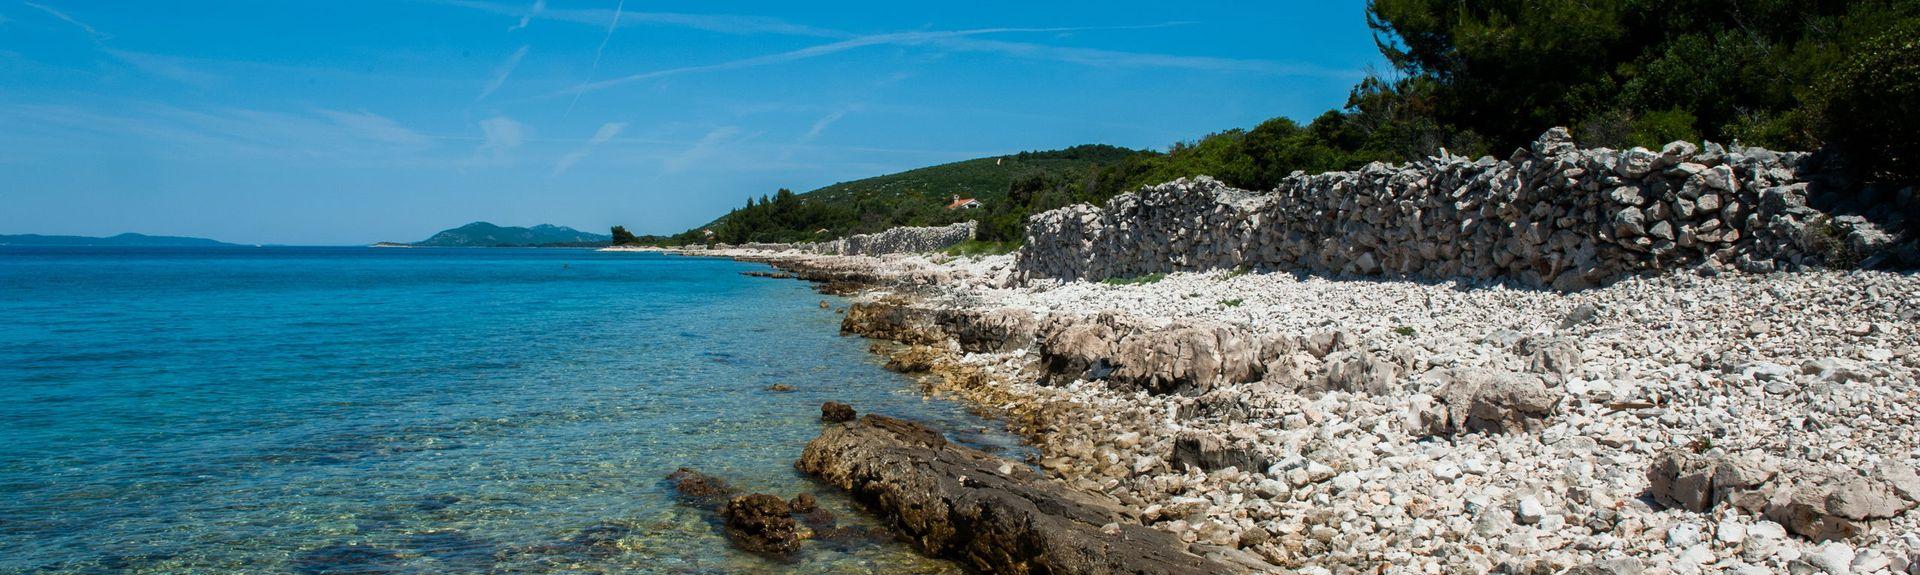 Parque natural Telascica, Sali, Zadar, Croacia